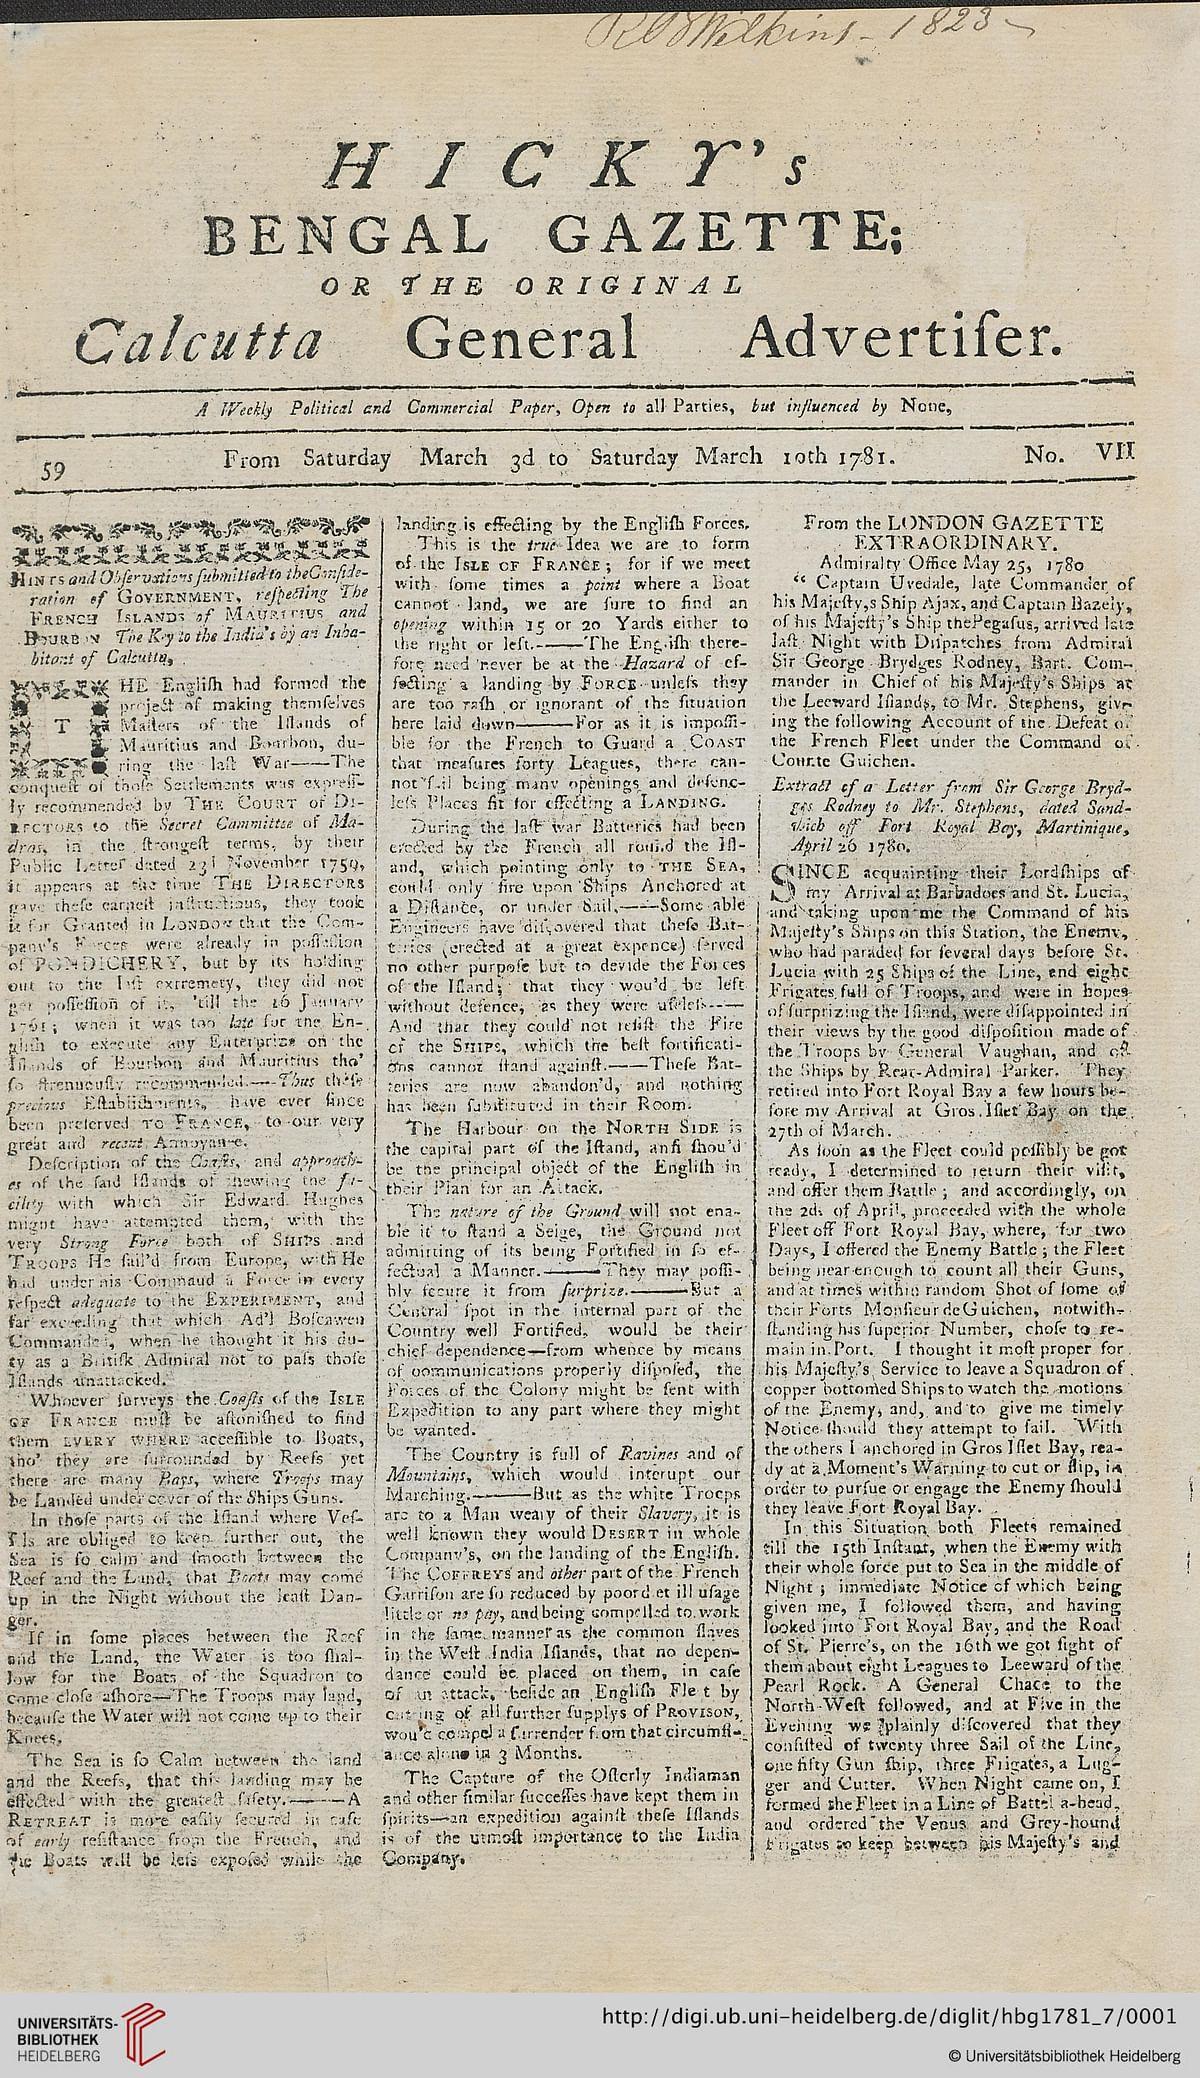 Hicky's Bengal Gazette (Source : Wikipedia)